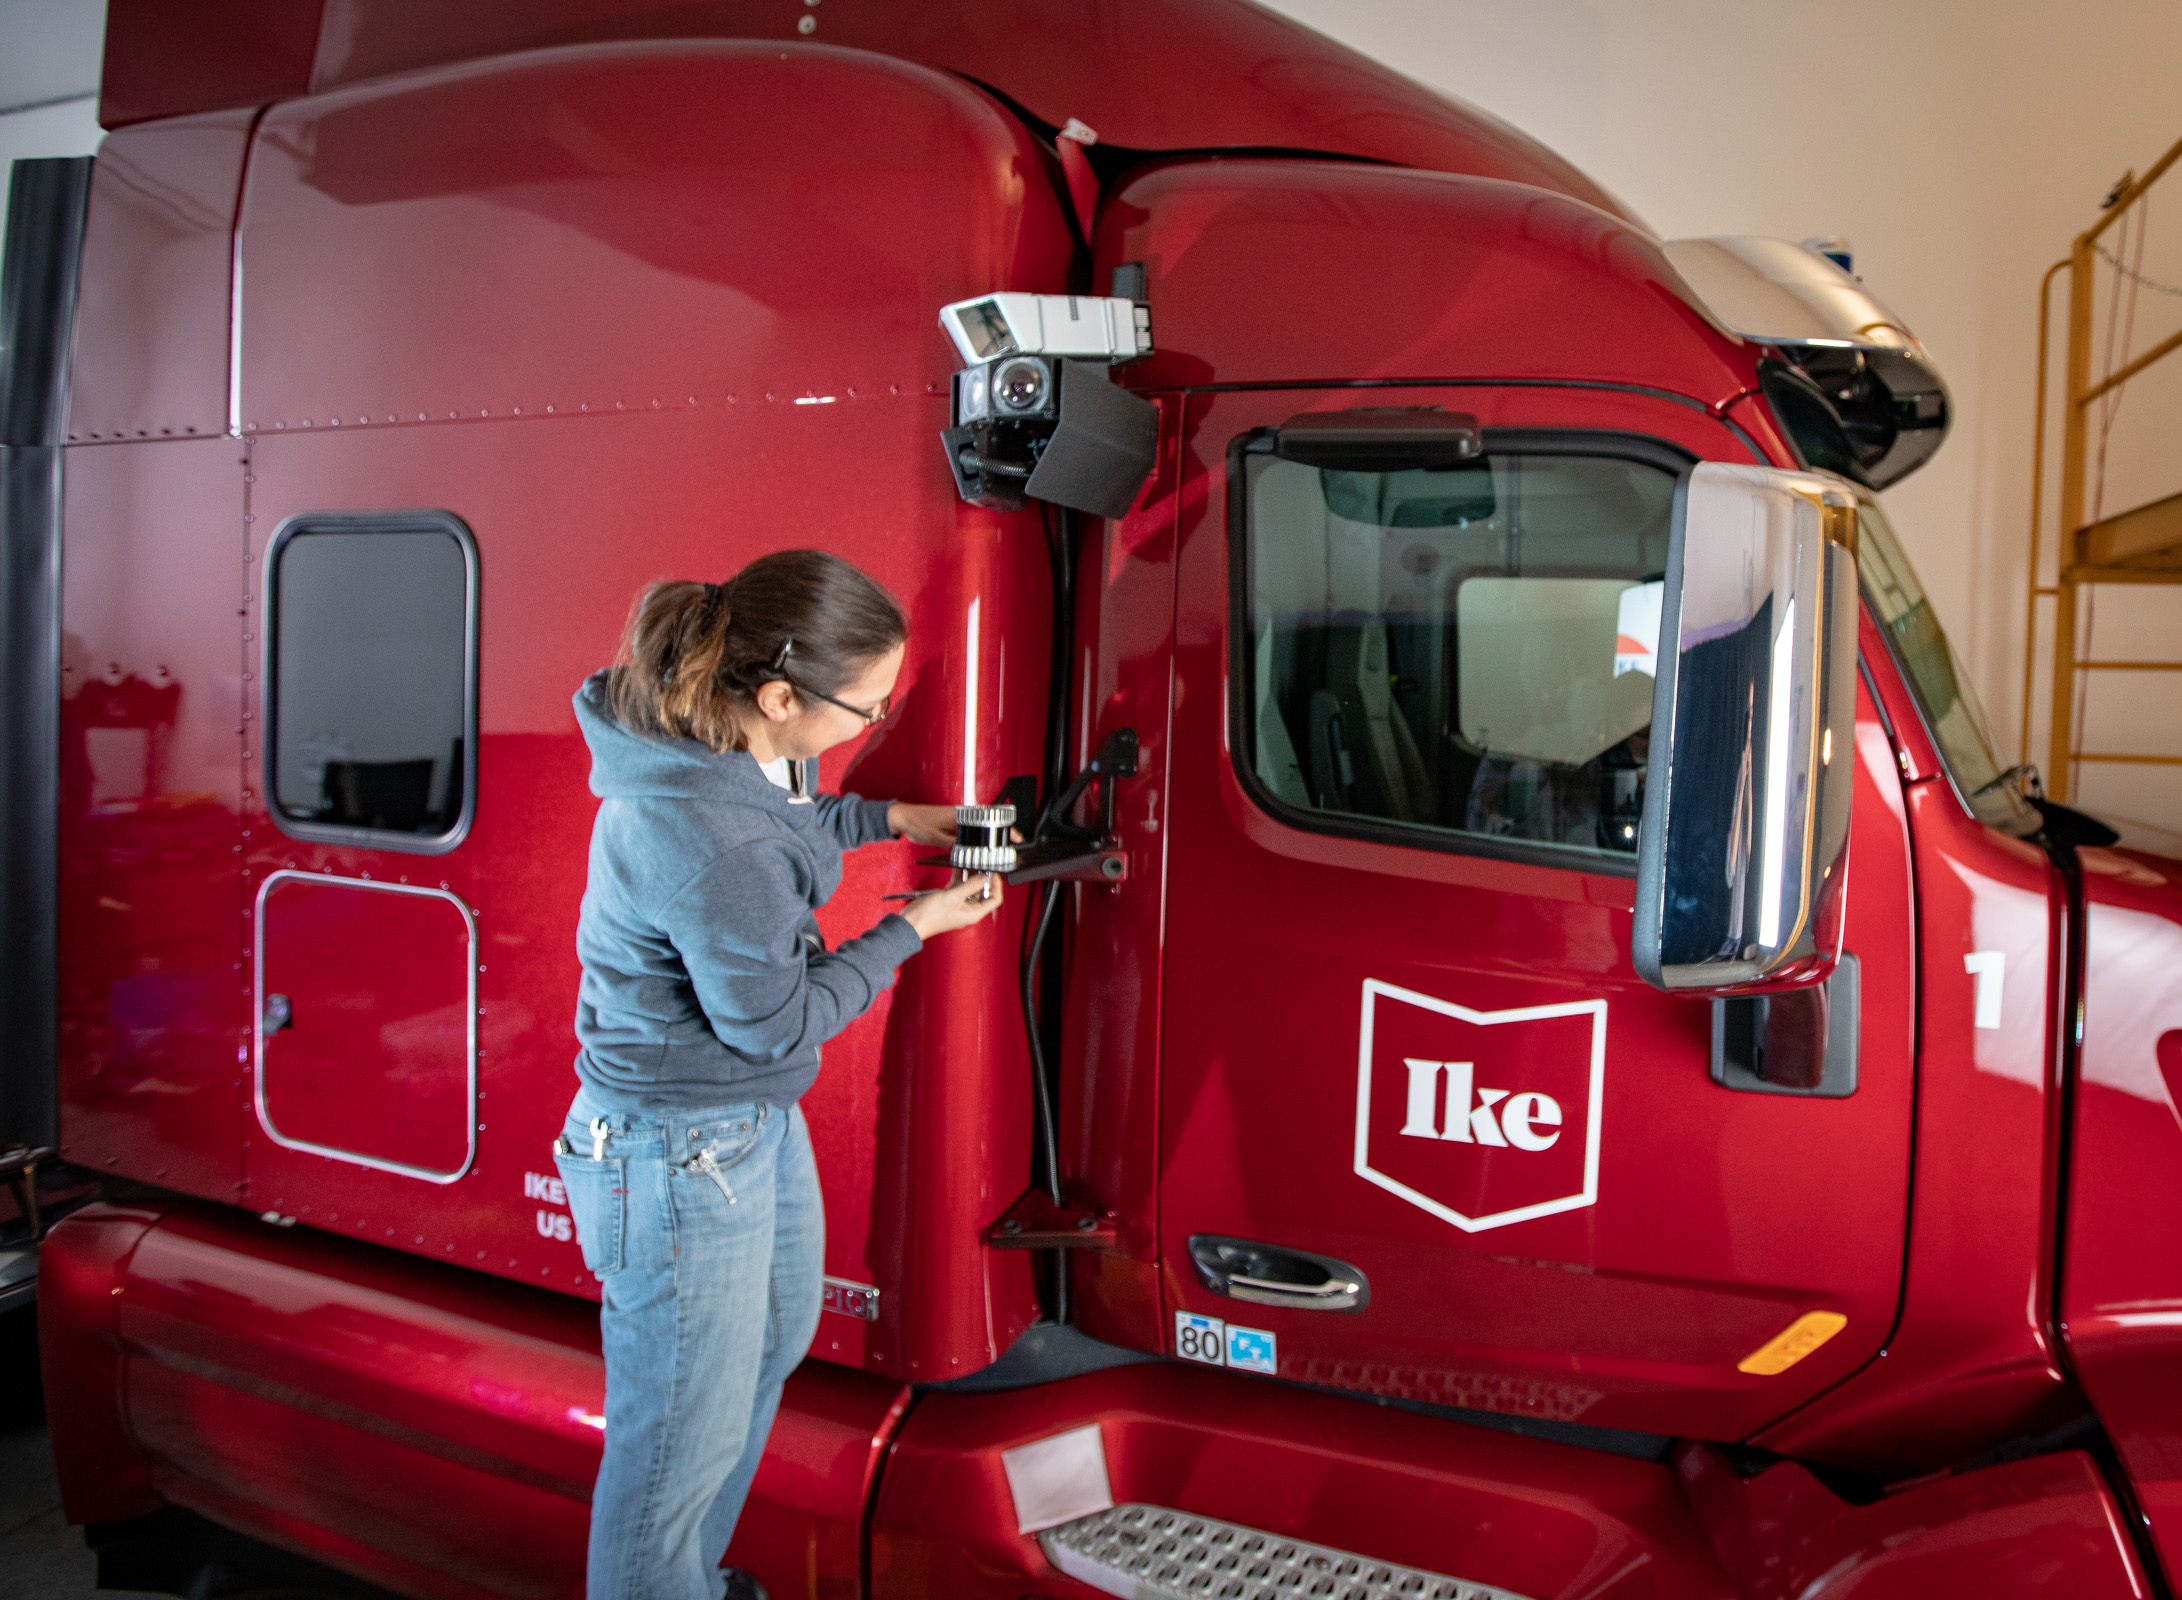 Ike Robotics uses Ouster lidar sensors